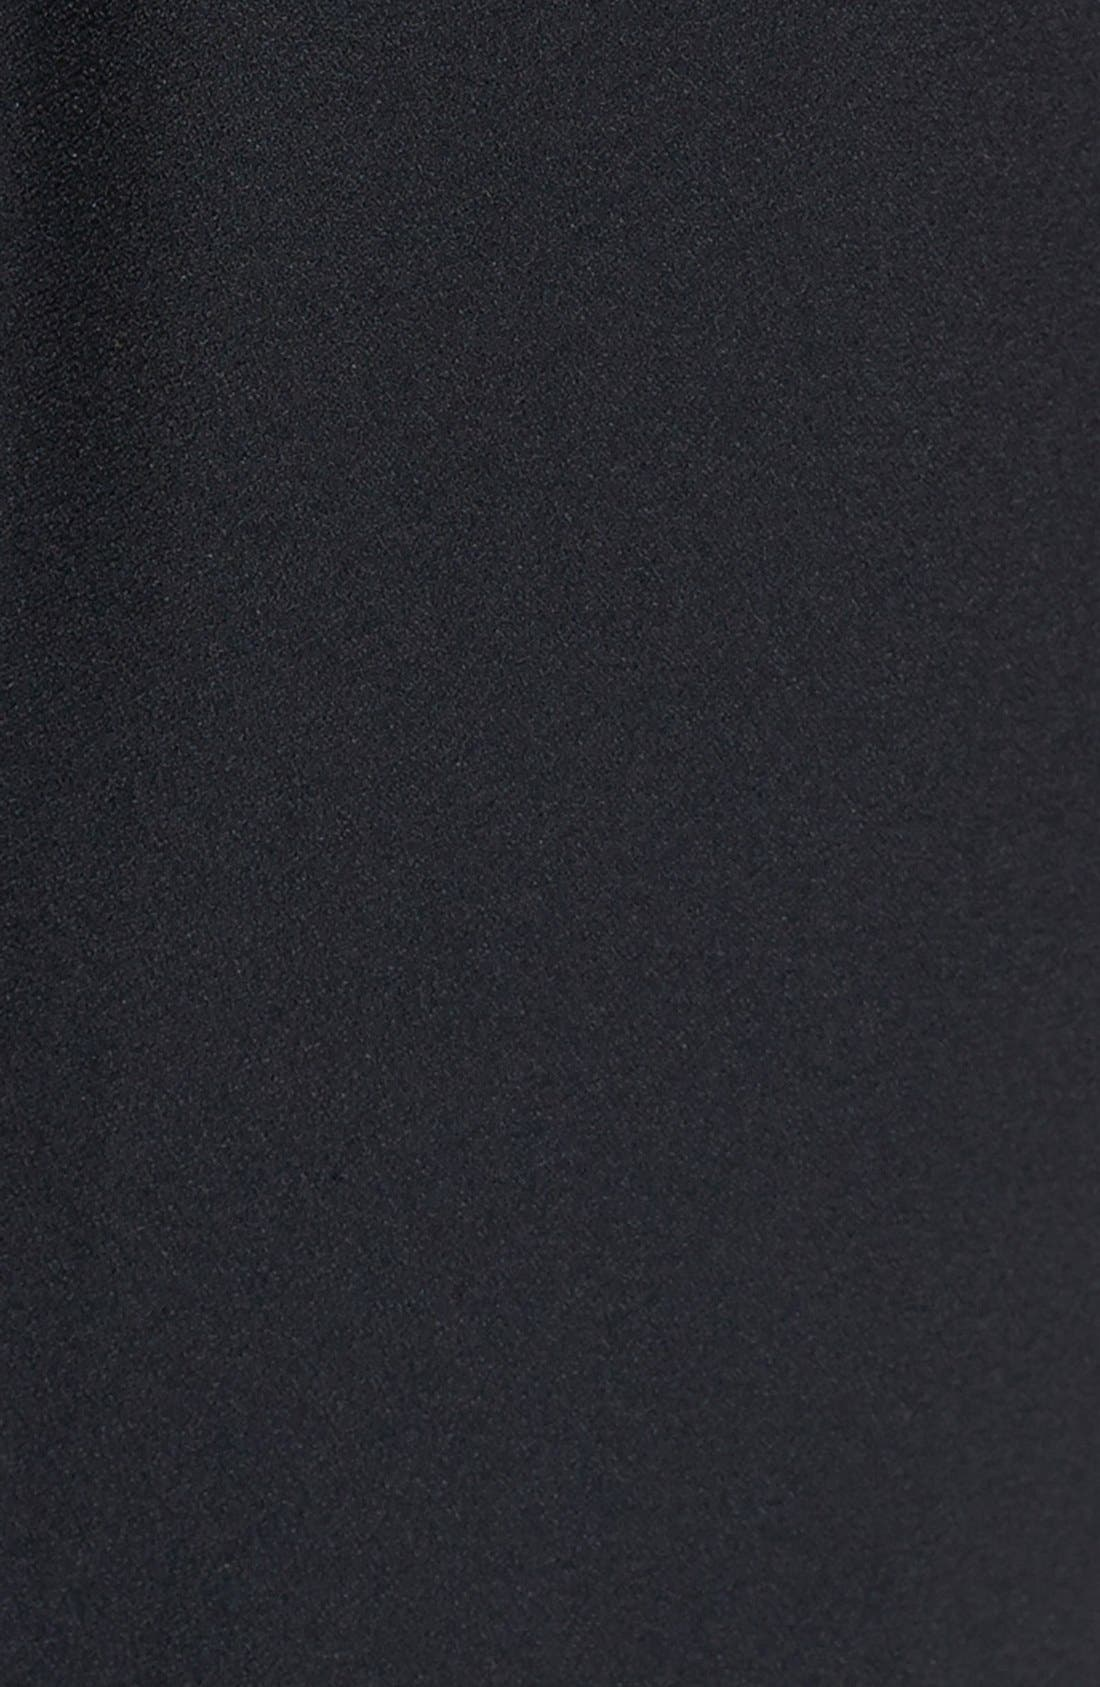 Alternate Image 3  - Bobeau Track Pants (Regular & Petite)